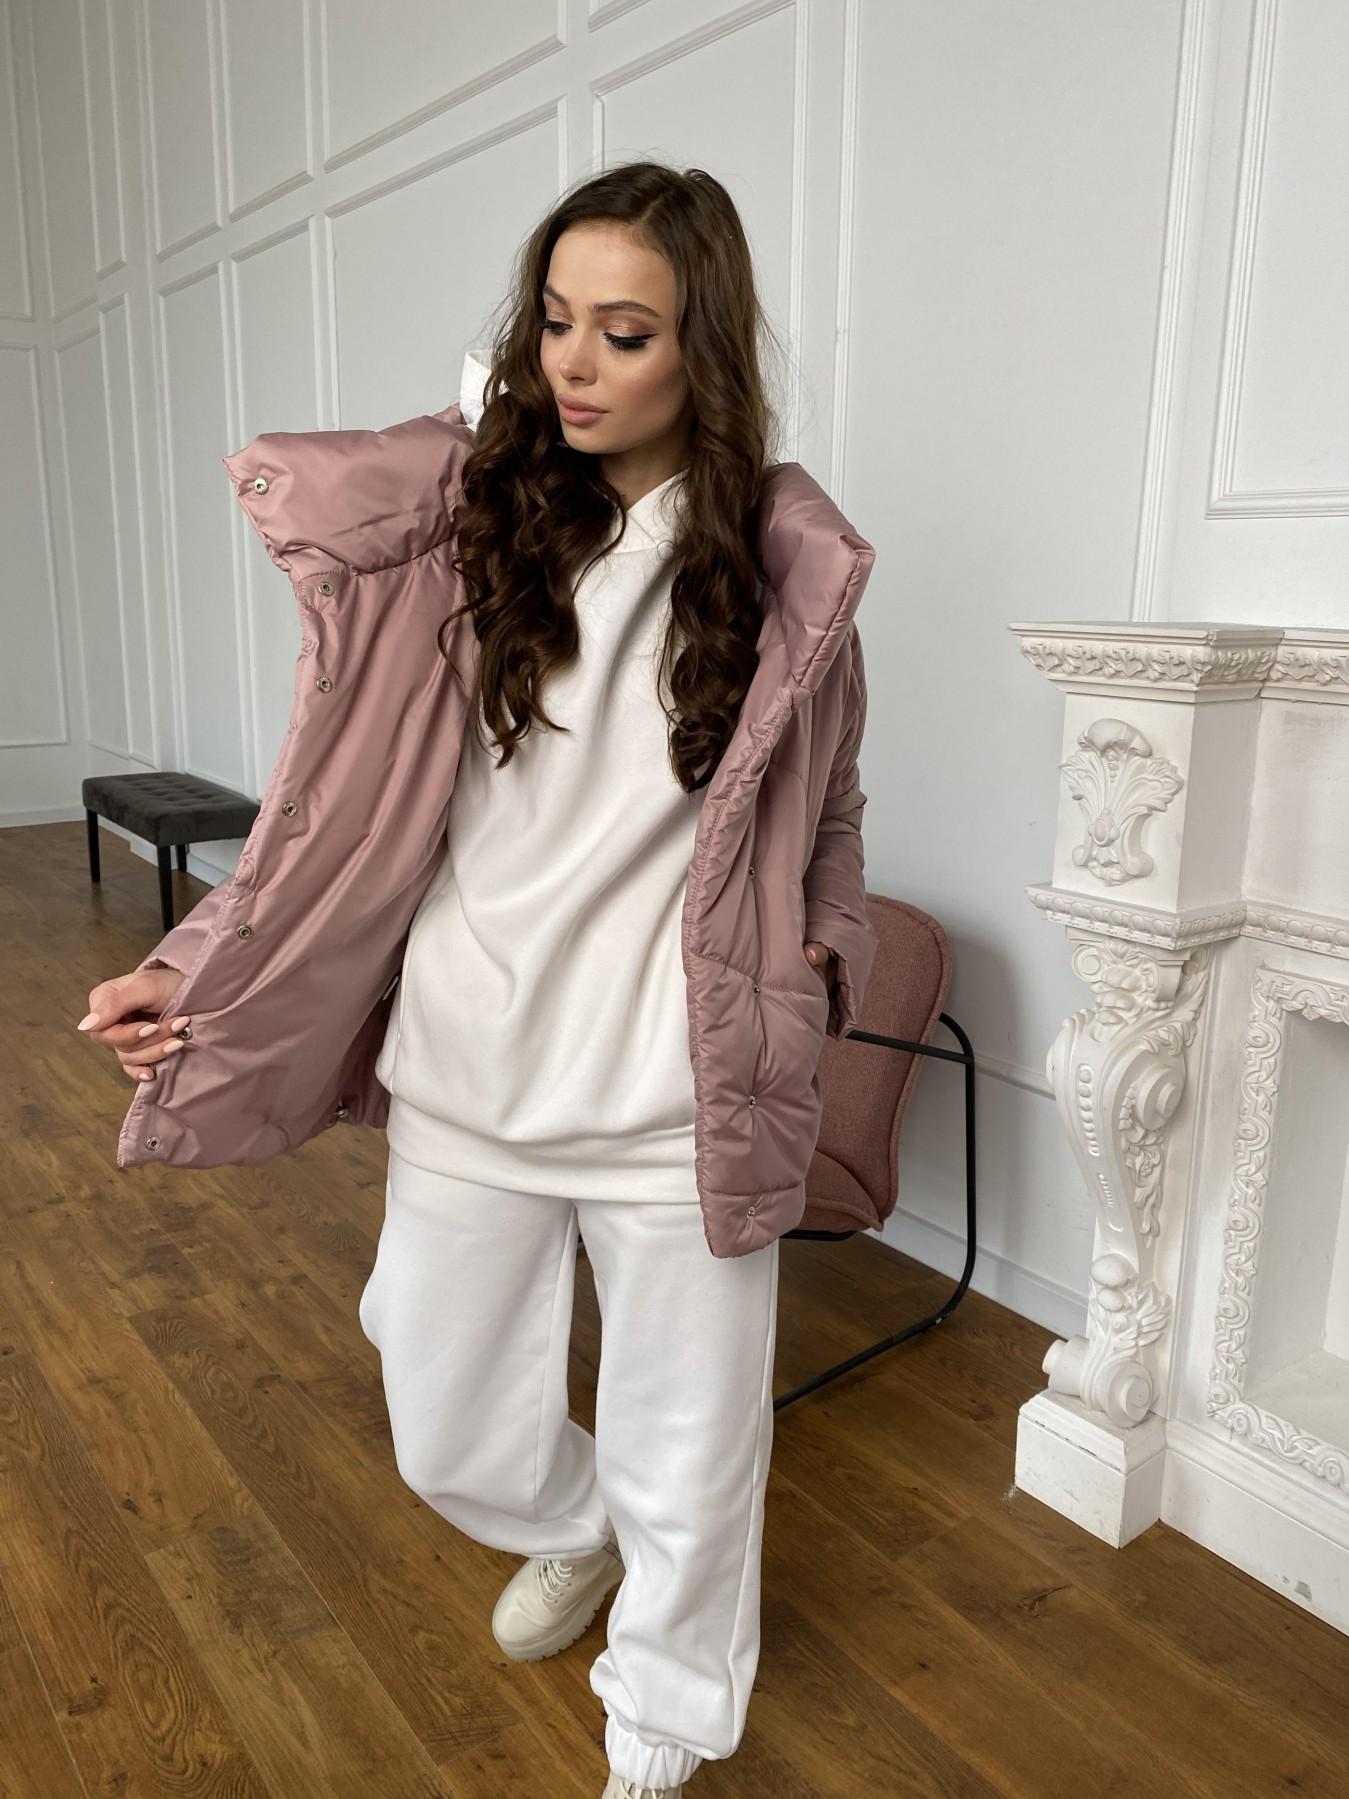 Уно куртка плащевка Ammy 10671 АРТ. 47409 Цвет: Пудра - фото 2, интернет магазин tm-modus.ru